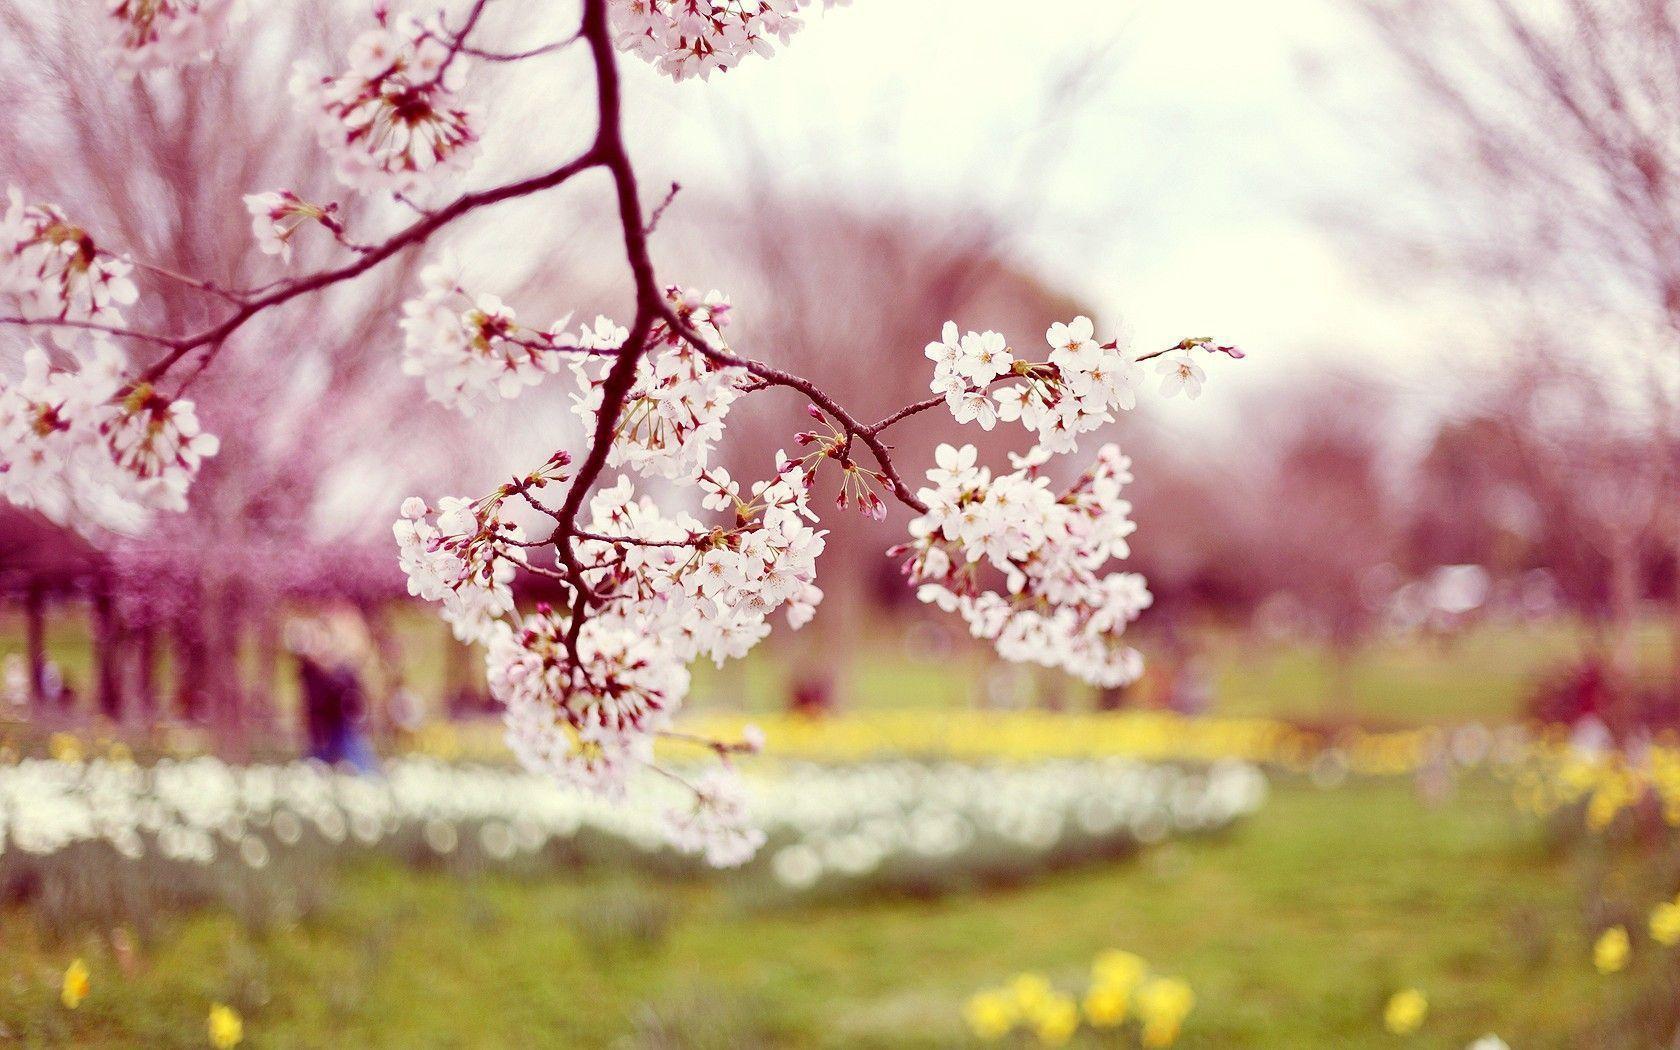 Flowers Spring Season Wallpaper Desktop 12338